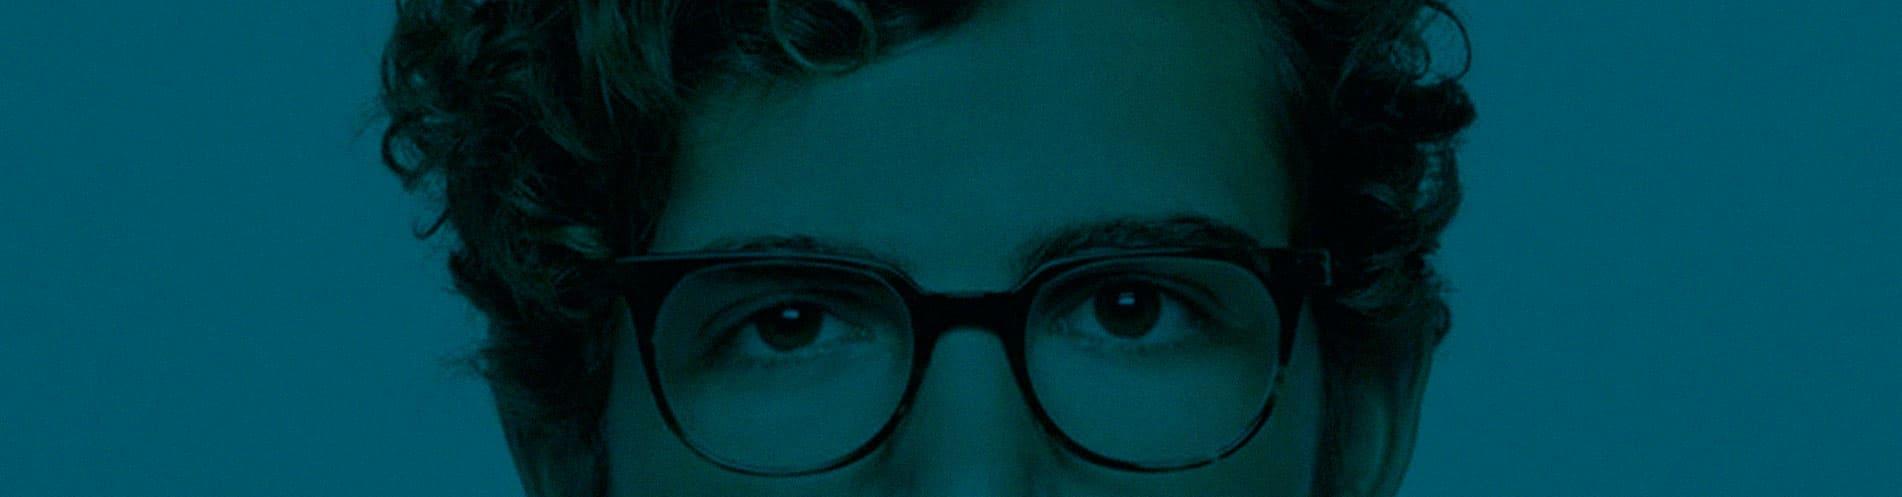 clear Eyeglasses 2